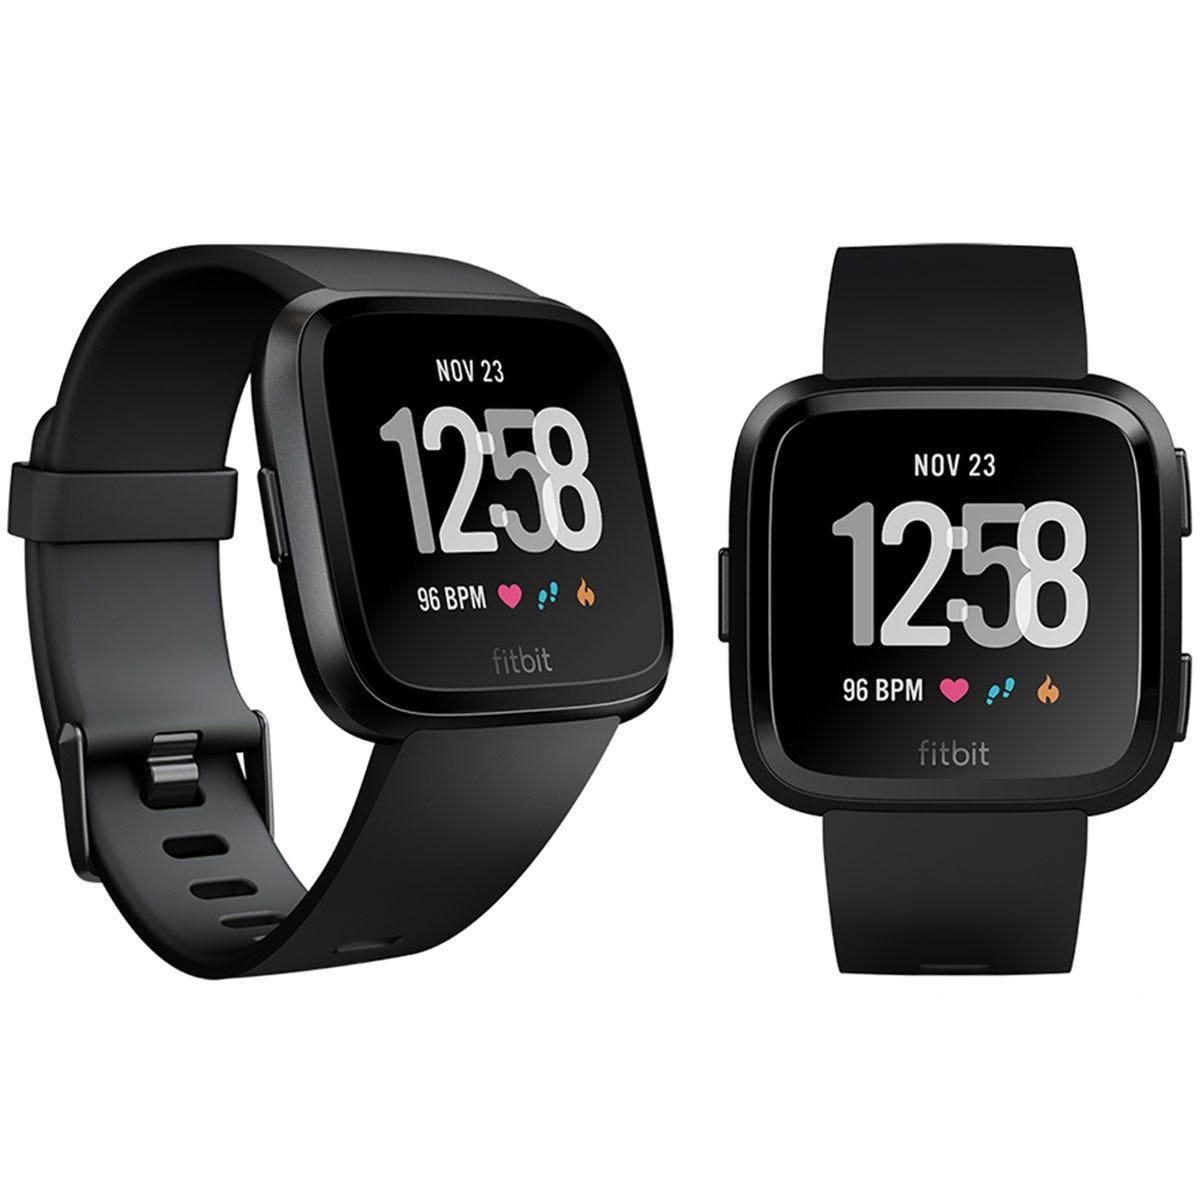 Fitbit Unisex Versa Health and Fitness Smartwatch - Black